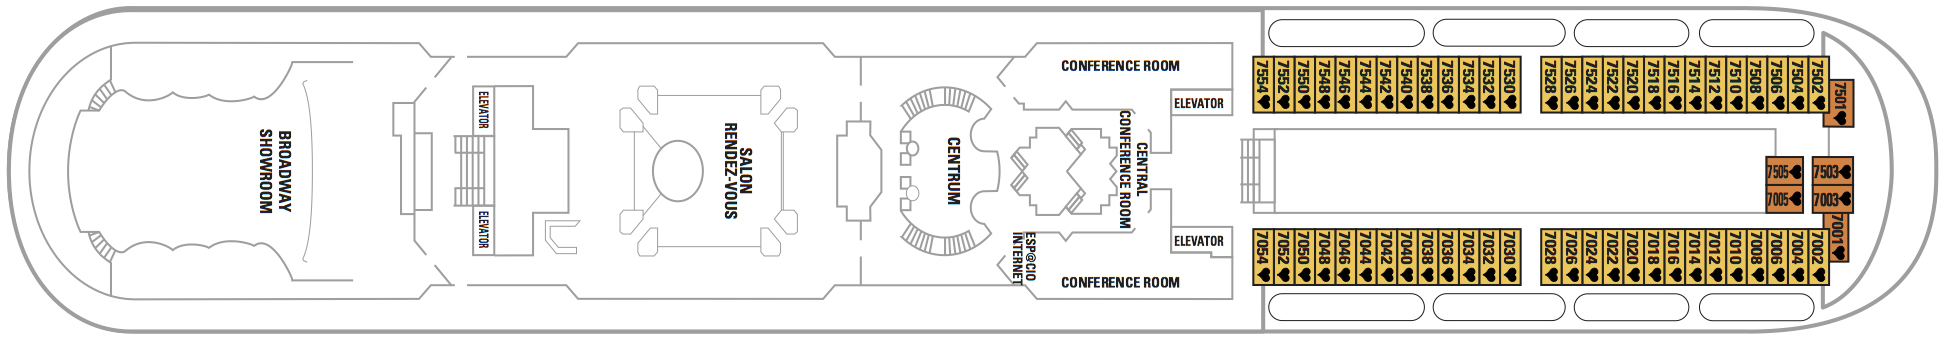 Pullmantur Sovereign Deck Plans Deck 7.jpg